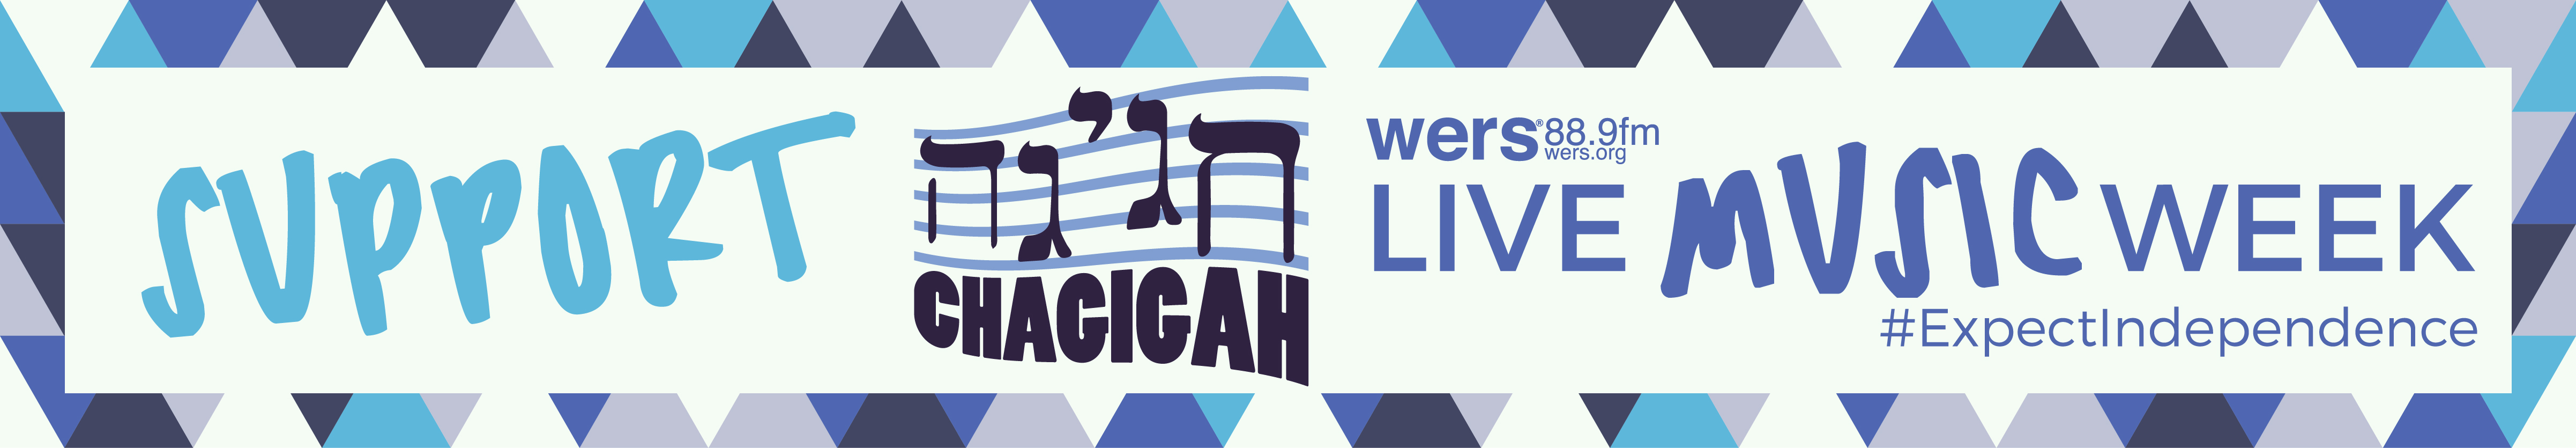 chagigah_LMW banner-100